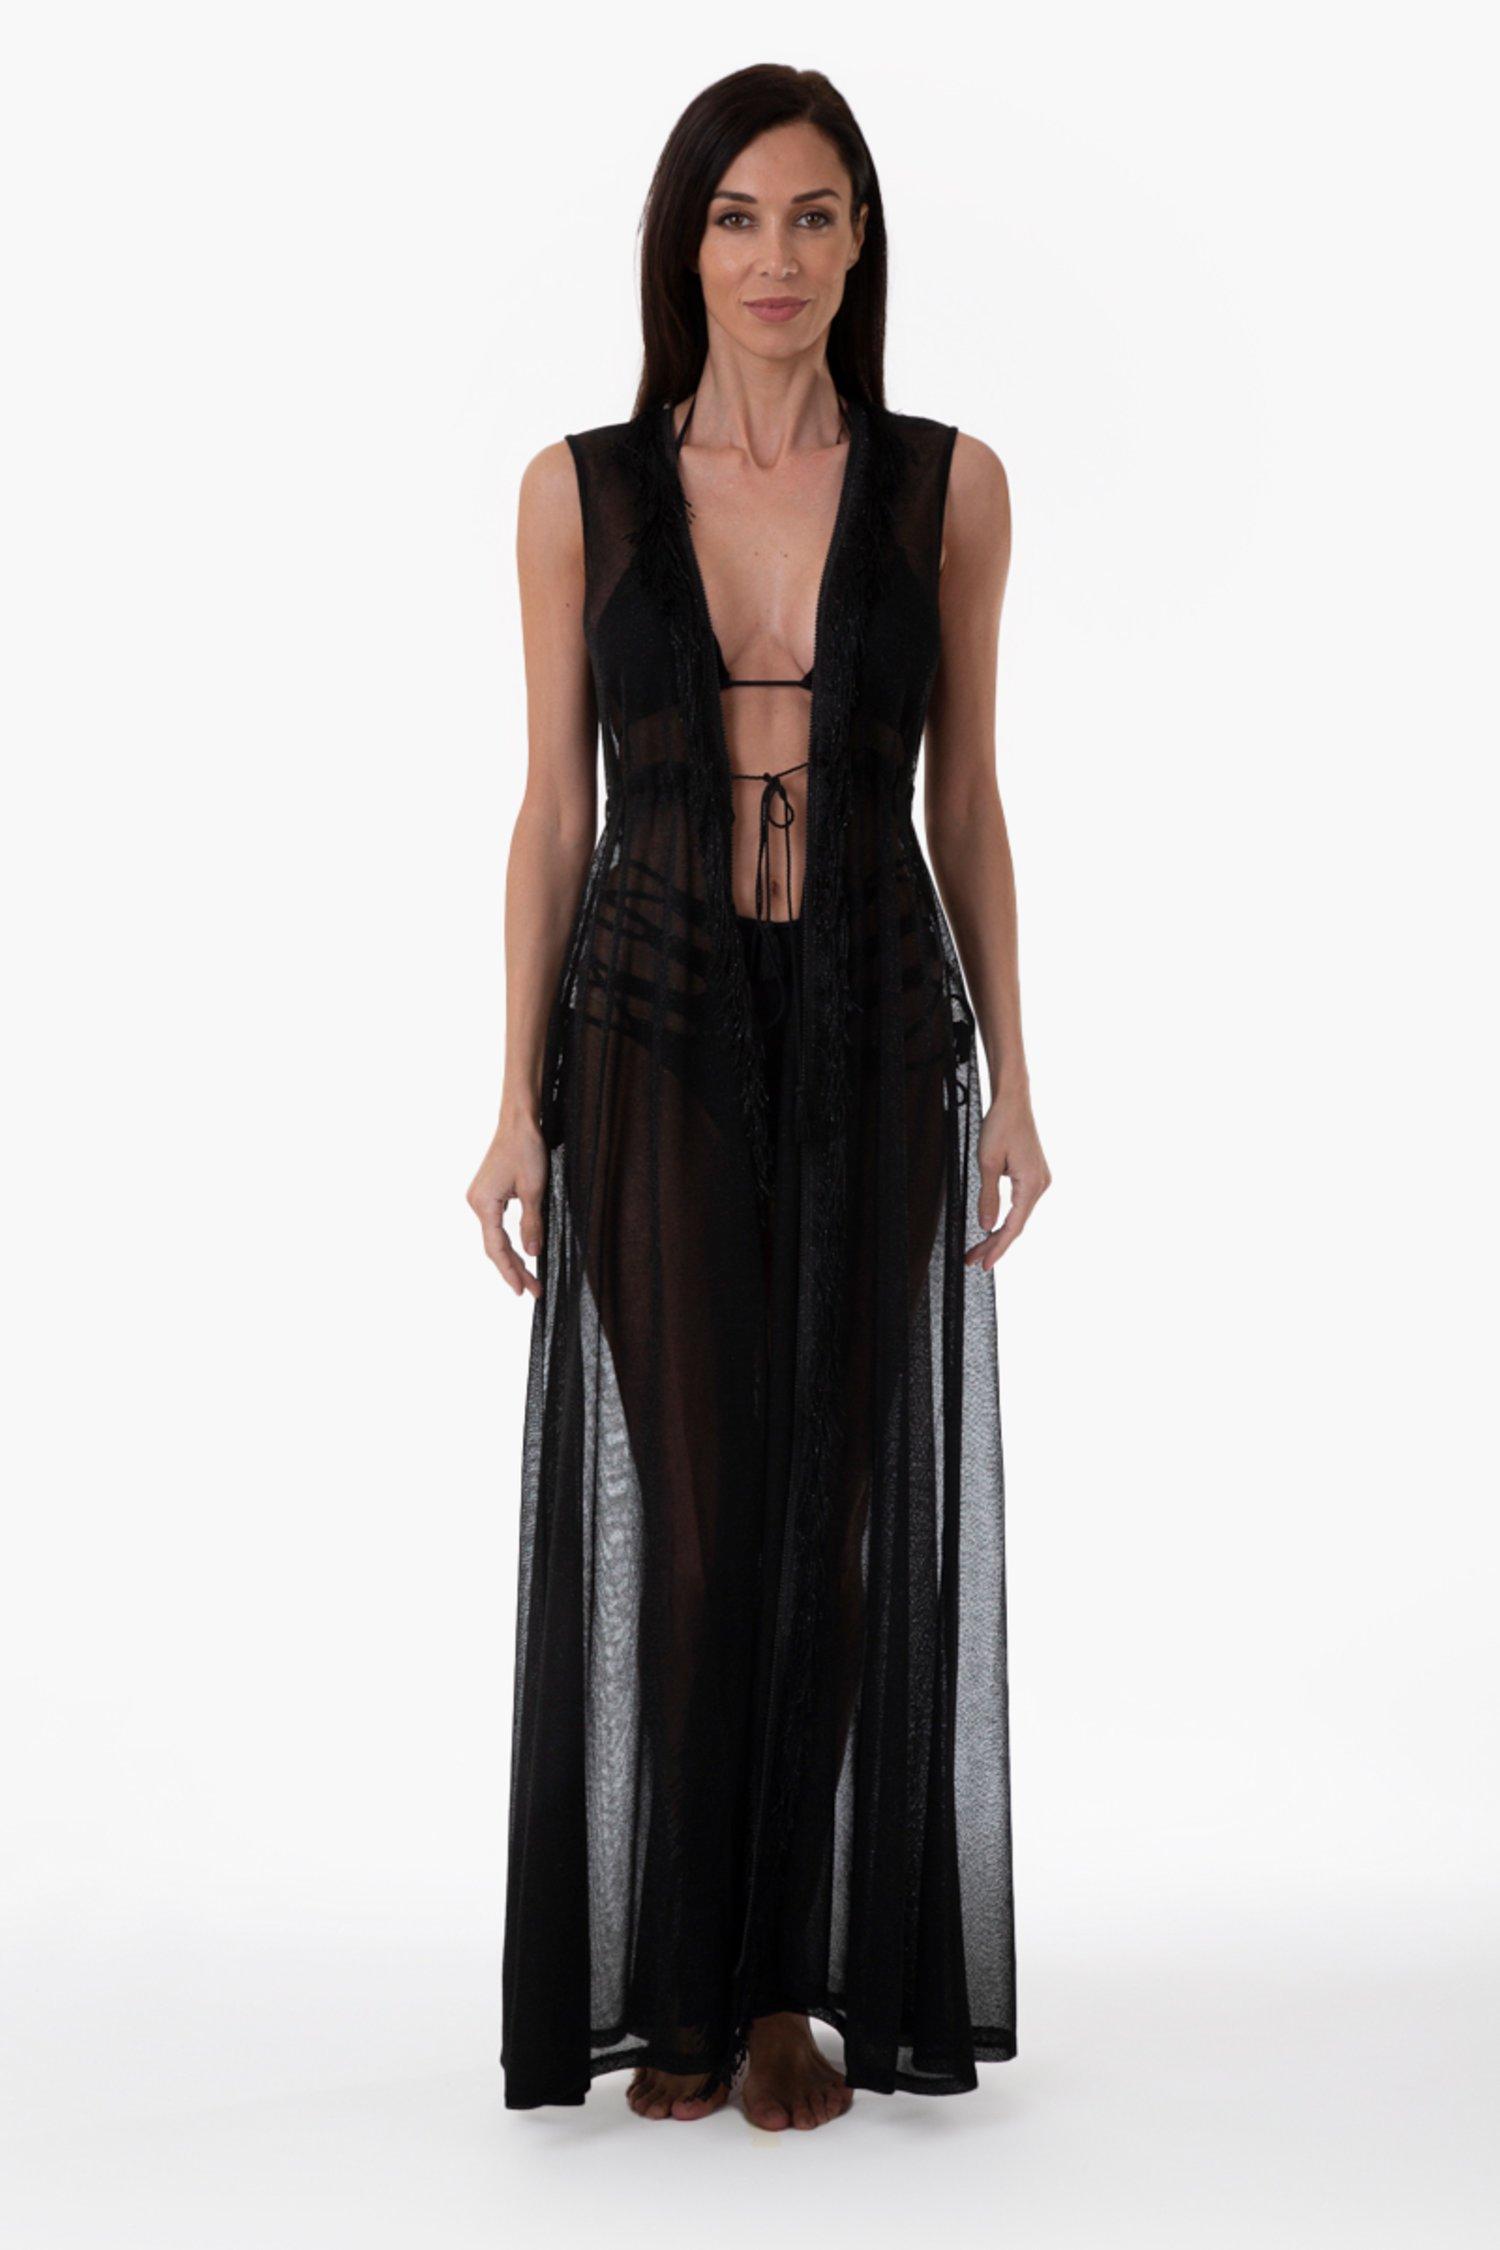 PLAIN COLOUR LUREX LONG ROBE DRESS - Maglia Lurex Nero